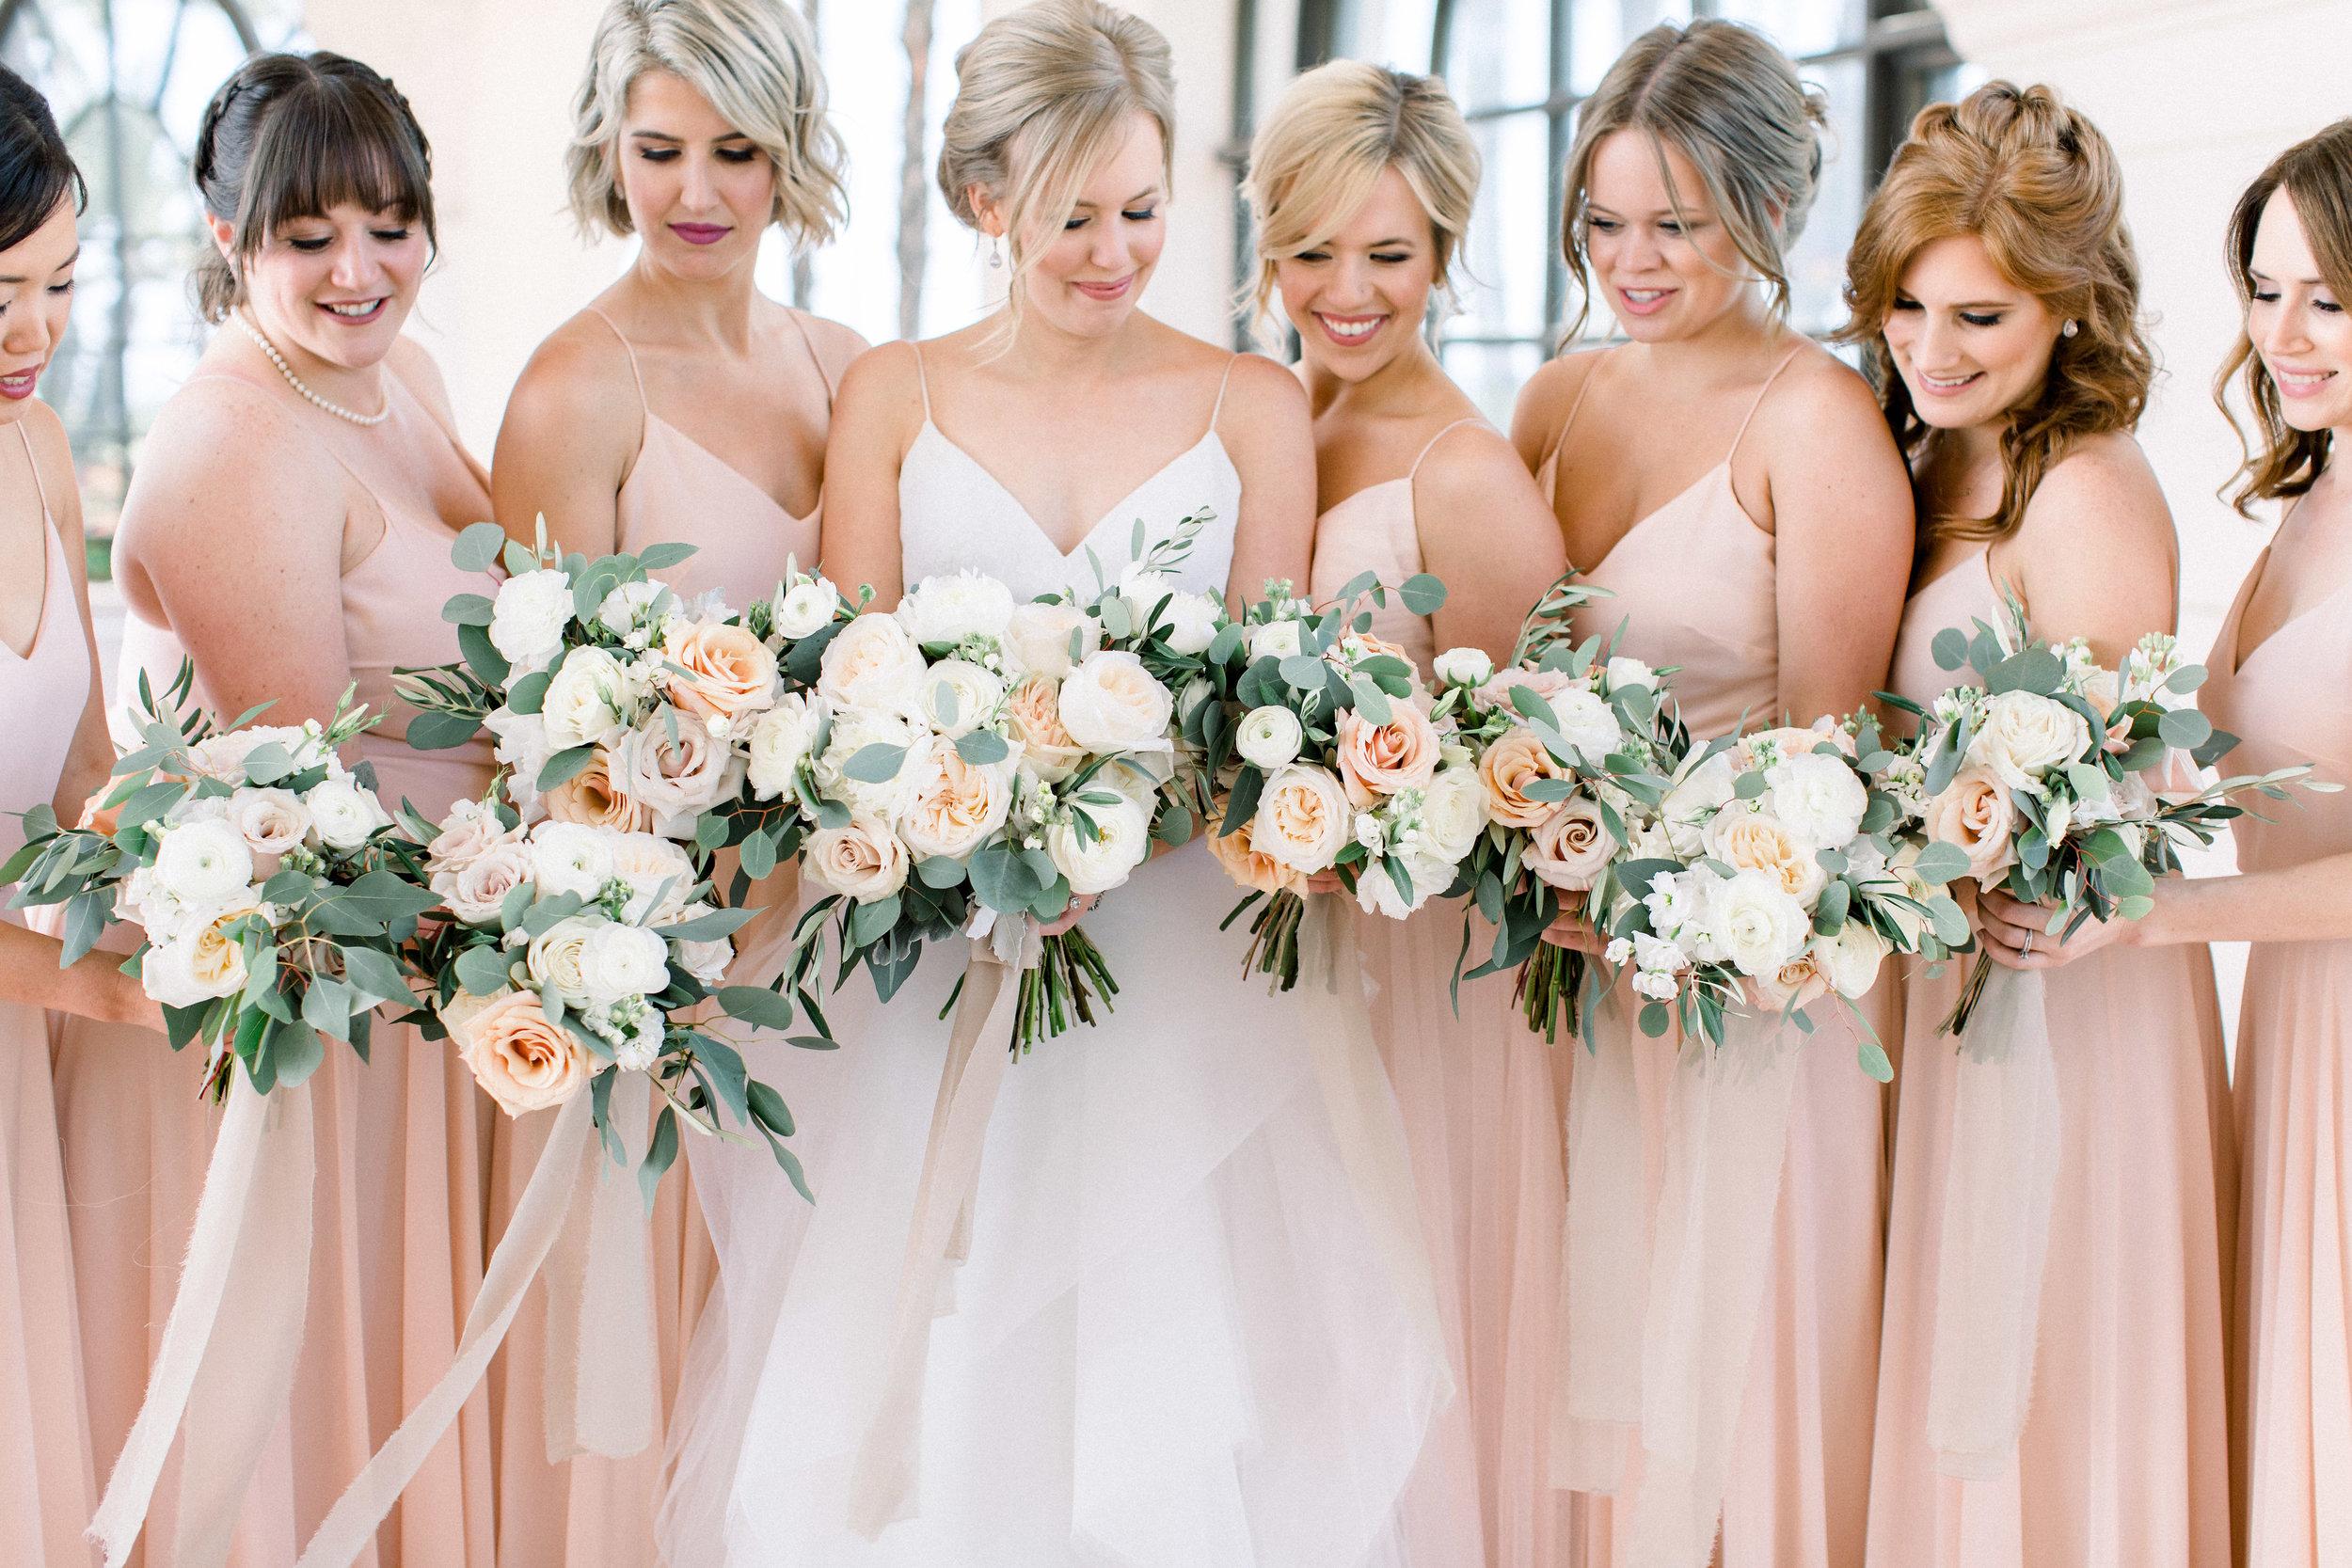 www.santabarbarawedding.com | Jenny Quicksall | Santa Barbara Club | Bluebell Events | Bride and Bridesmaids